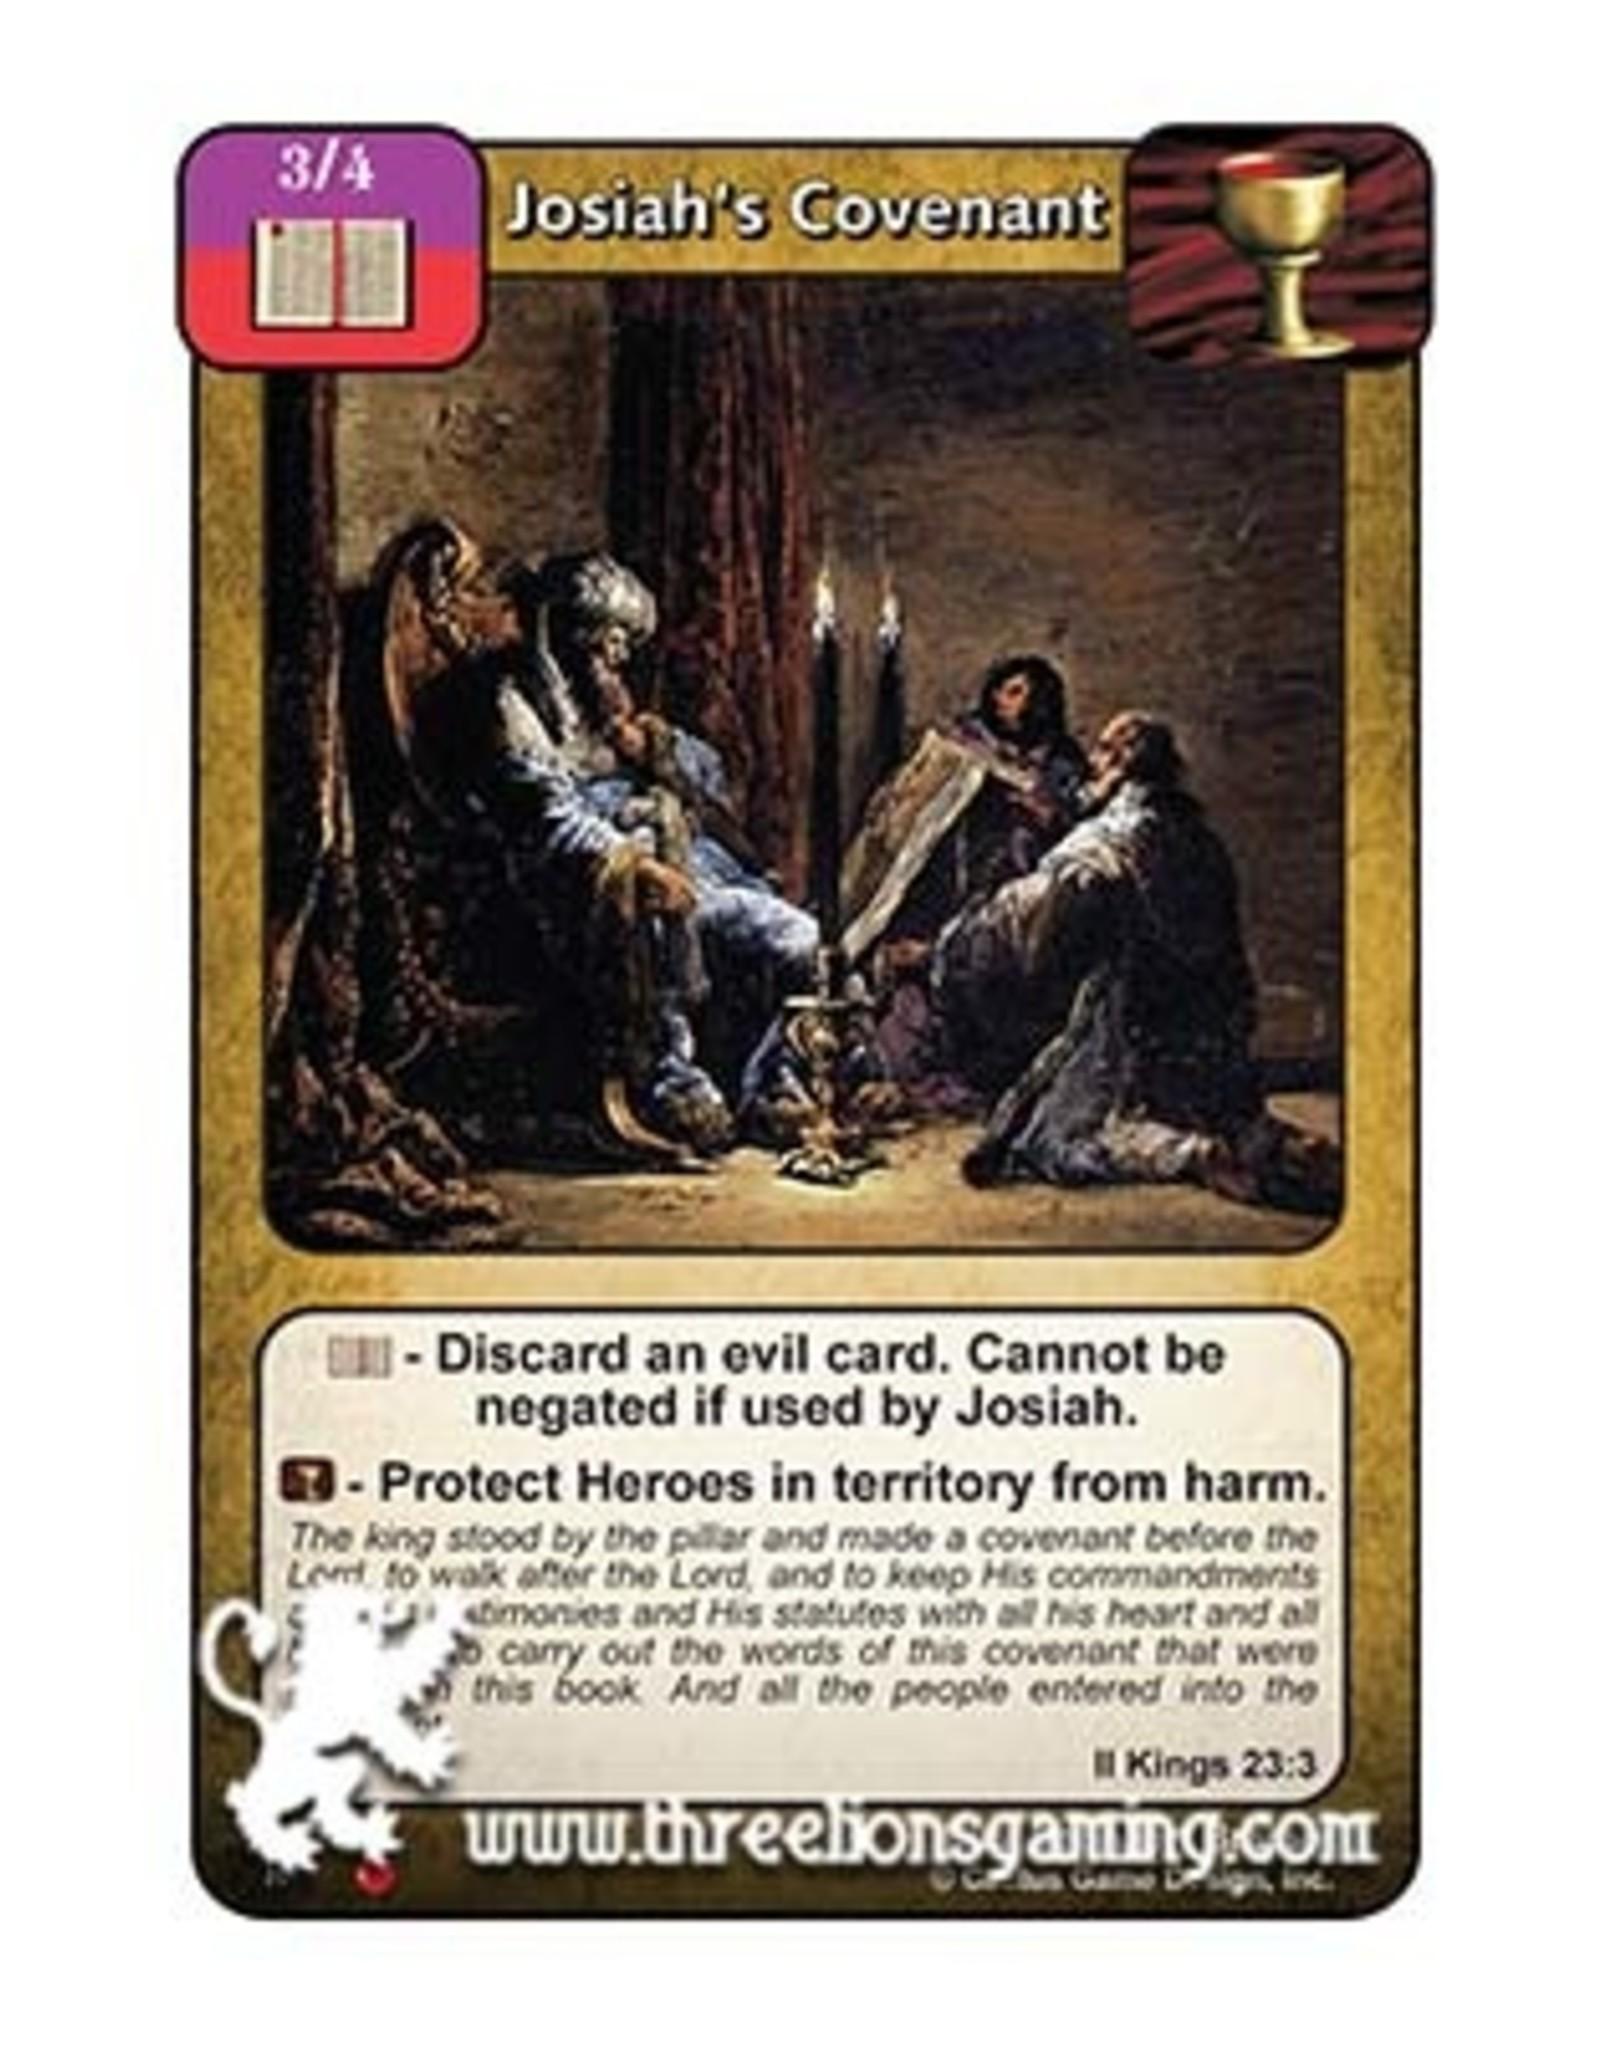 LoC: Josiah's Covenant